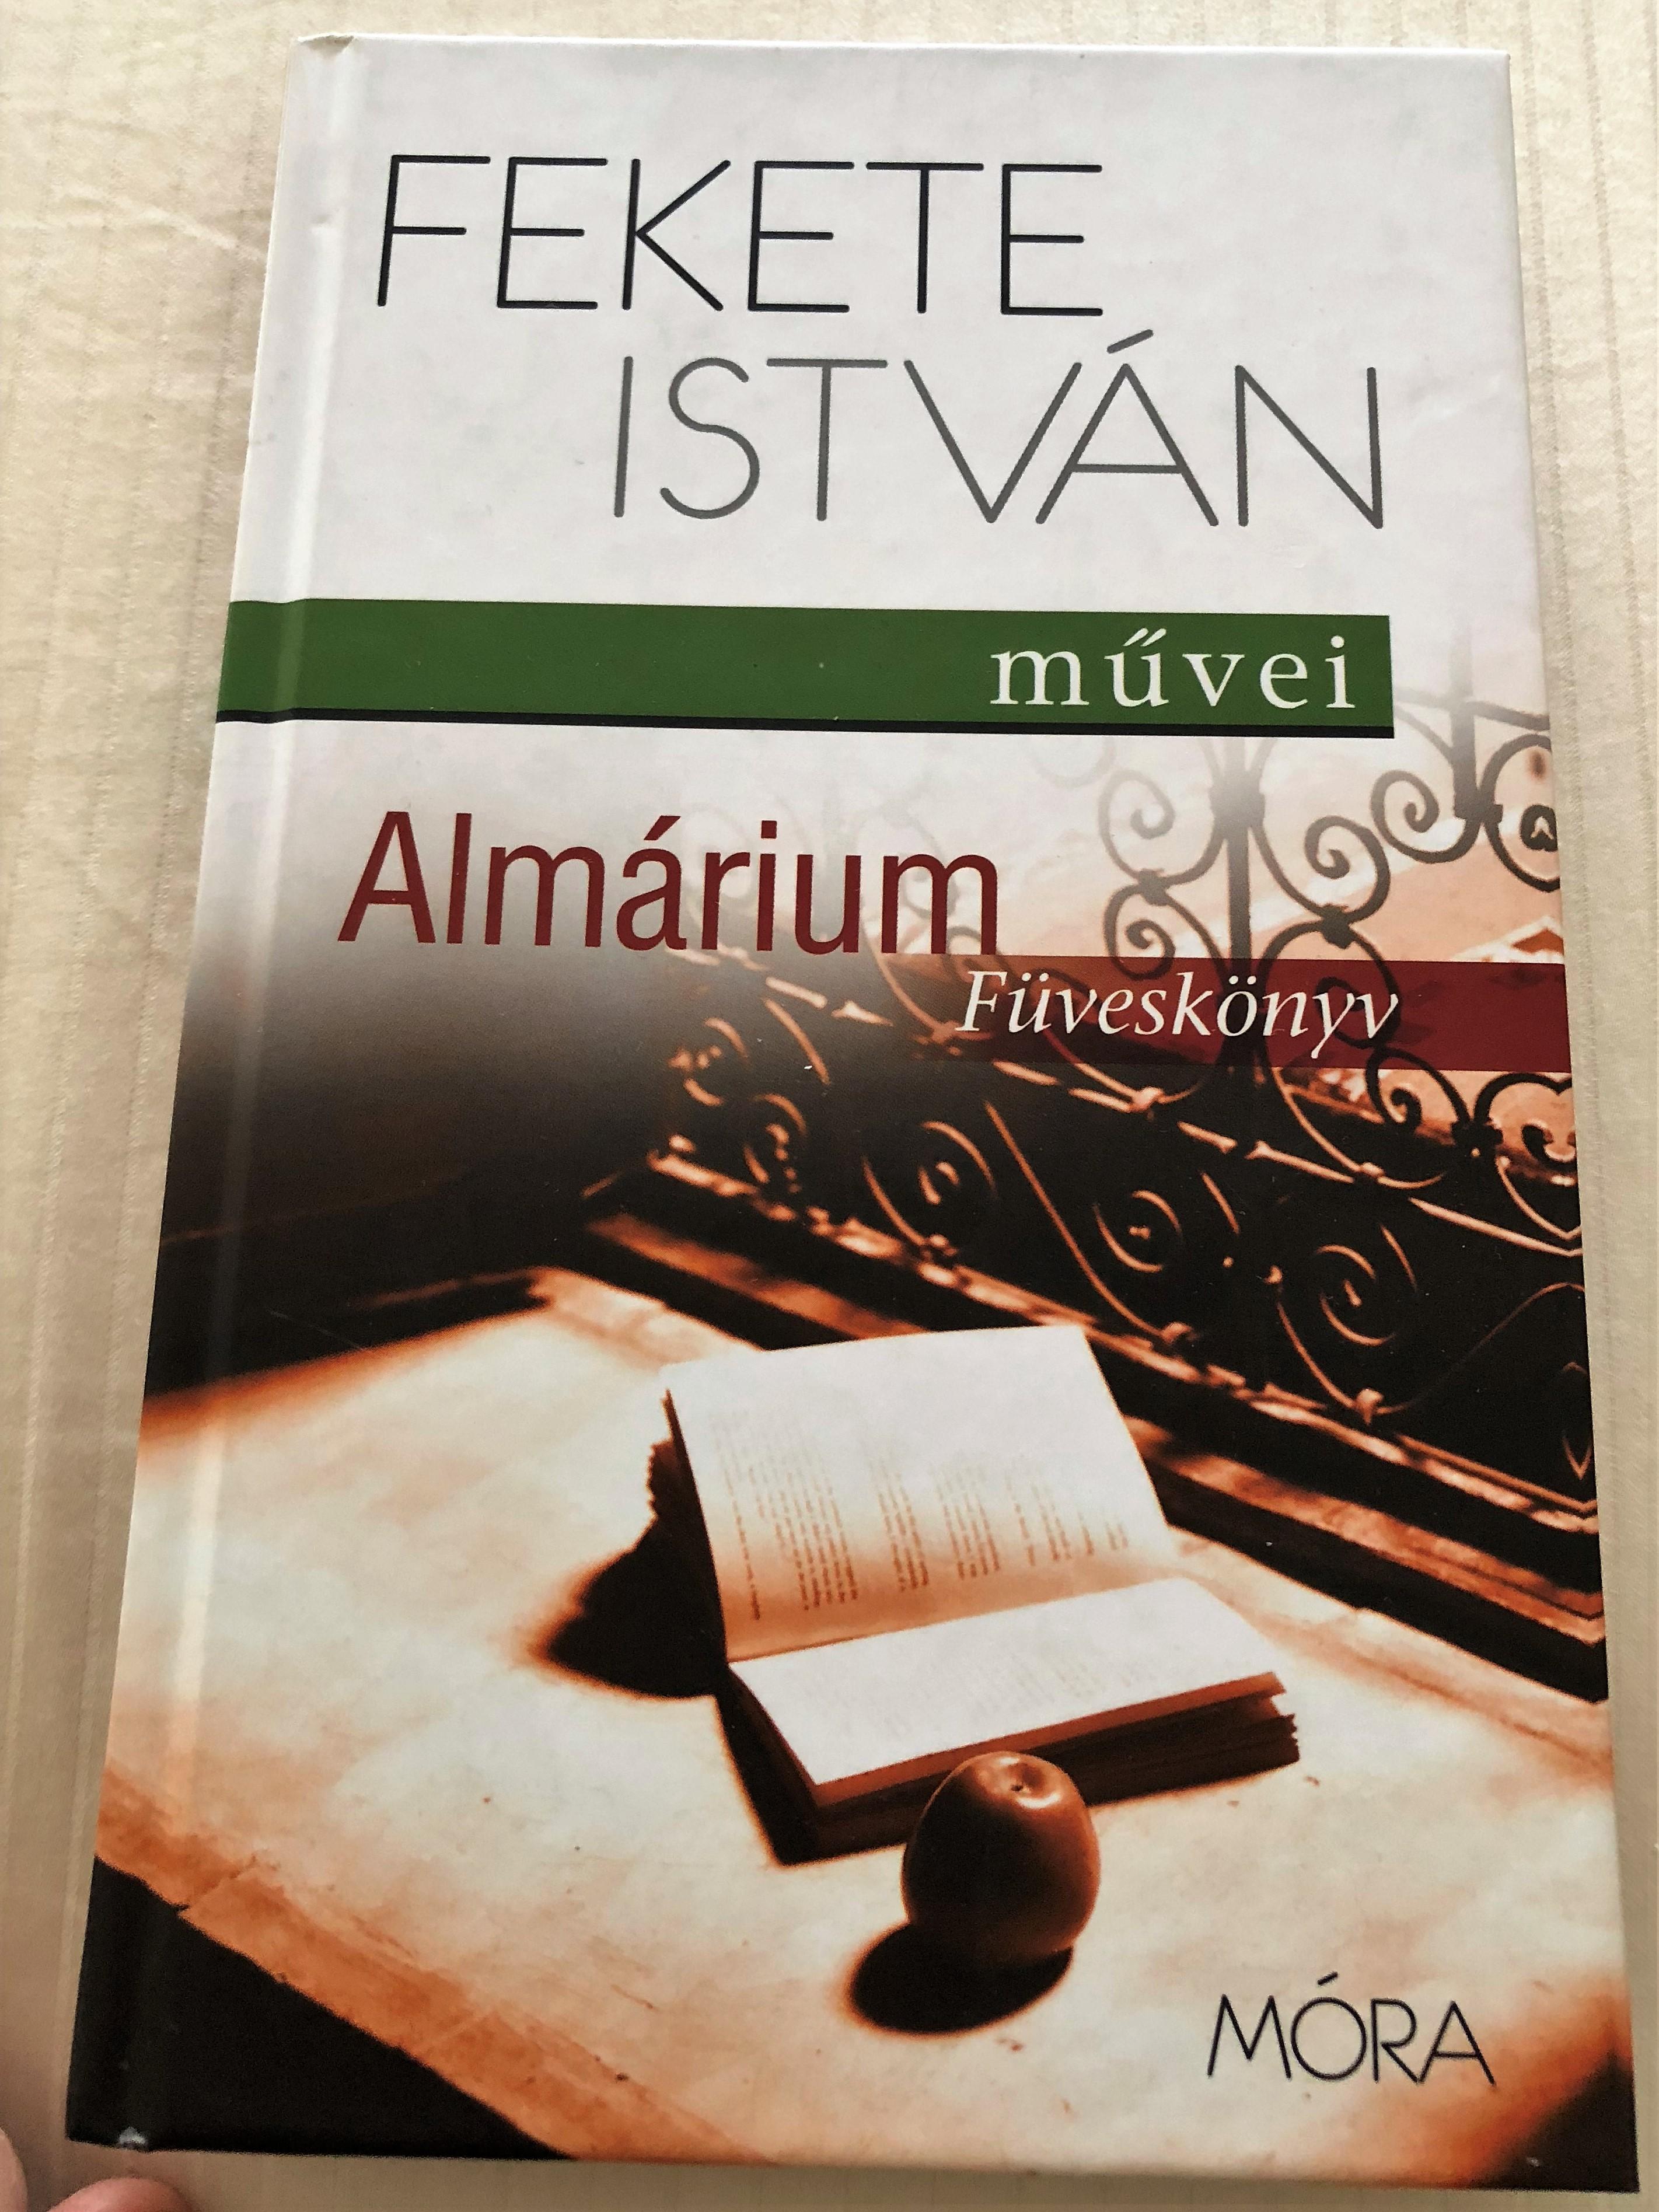 -alm-rium-f-vesk-nyv-by-fekete-istv-n-illustrations-by-vid-gy-z-m-ra-k-nyvkiad-2012-paperback-1-.jpg